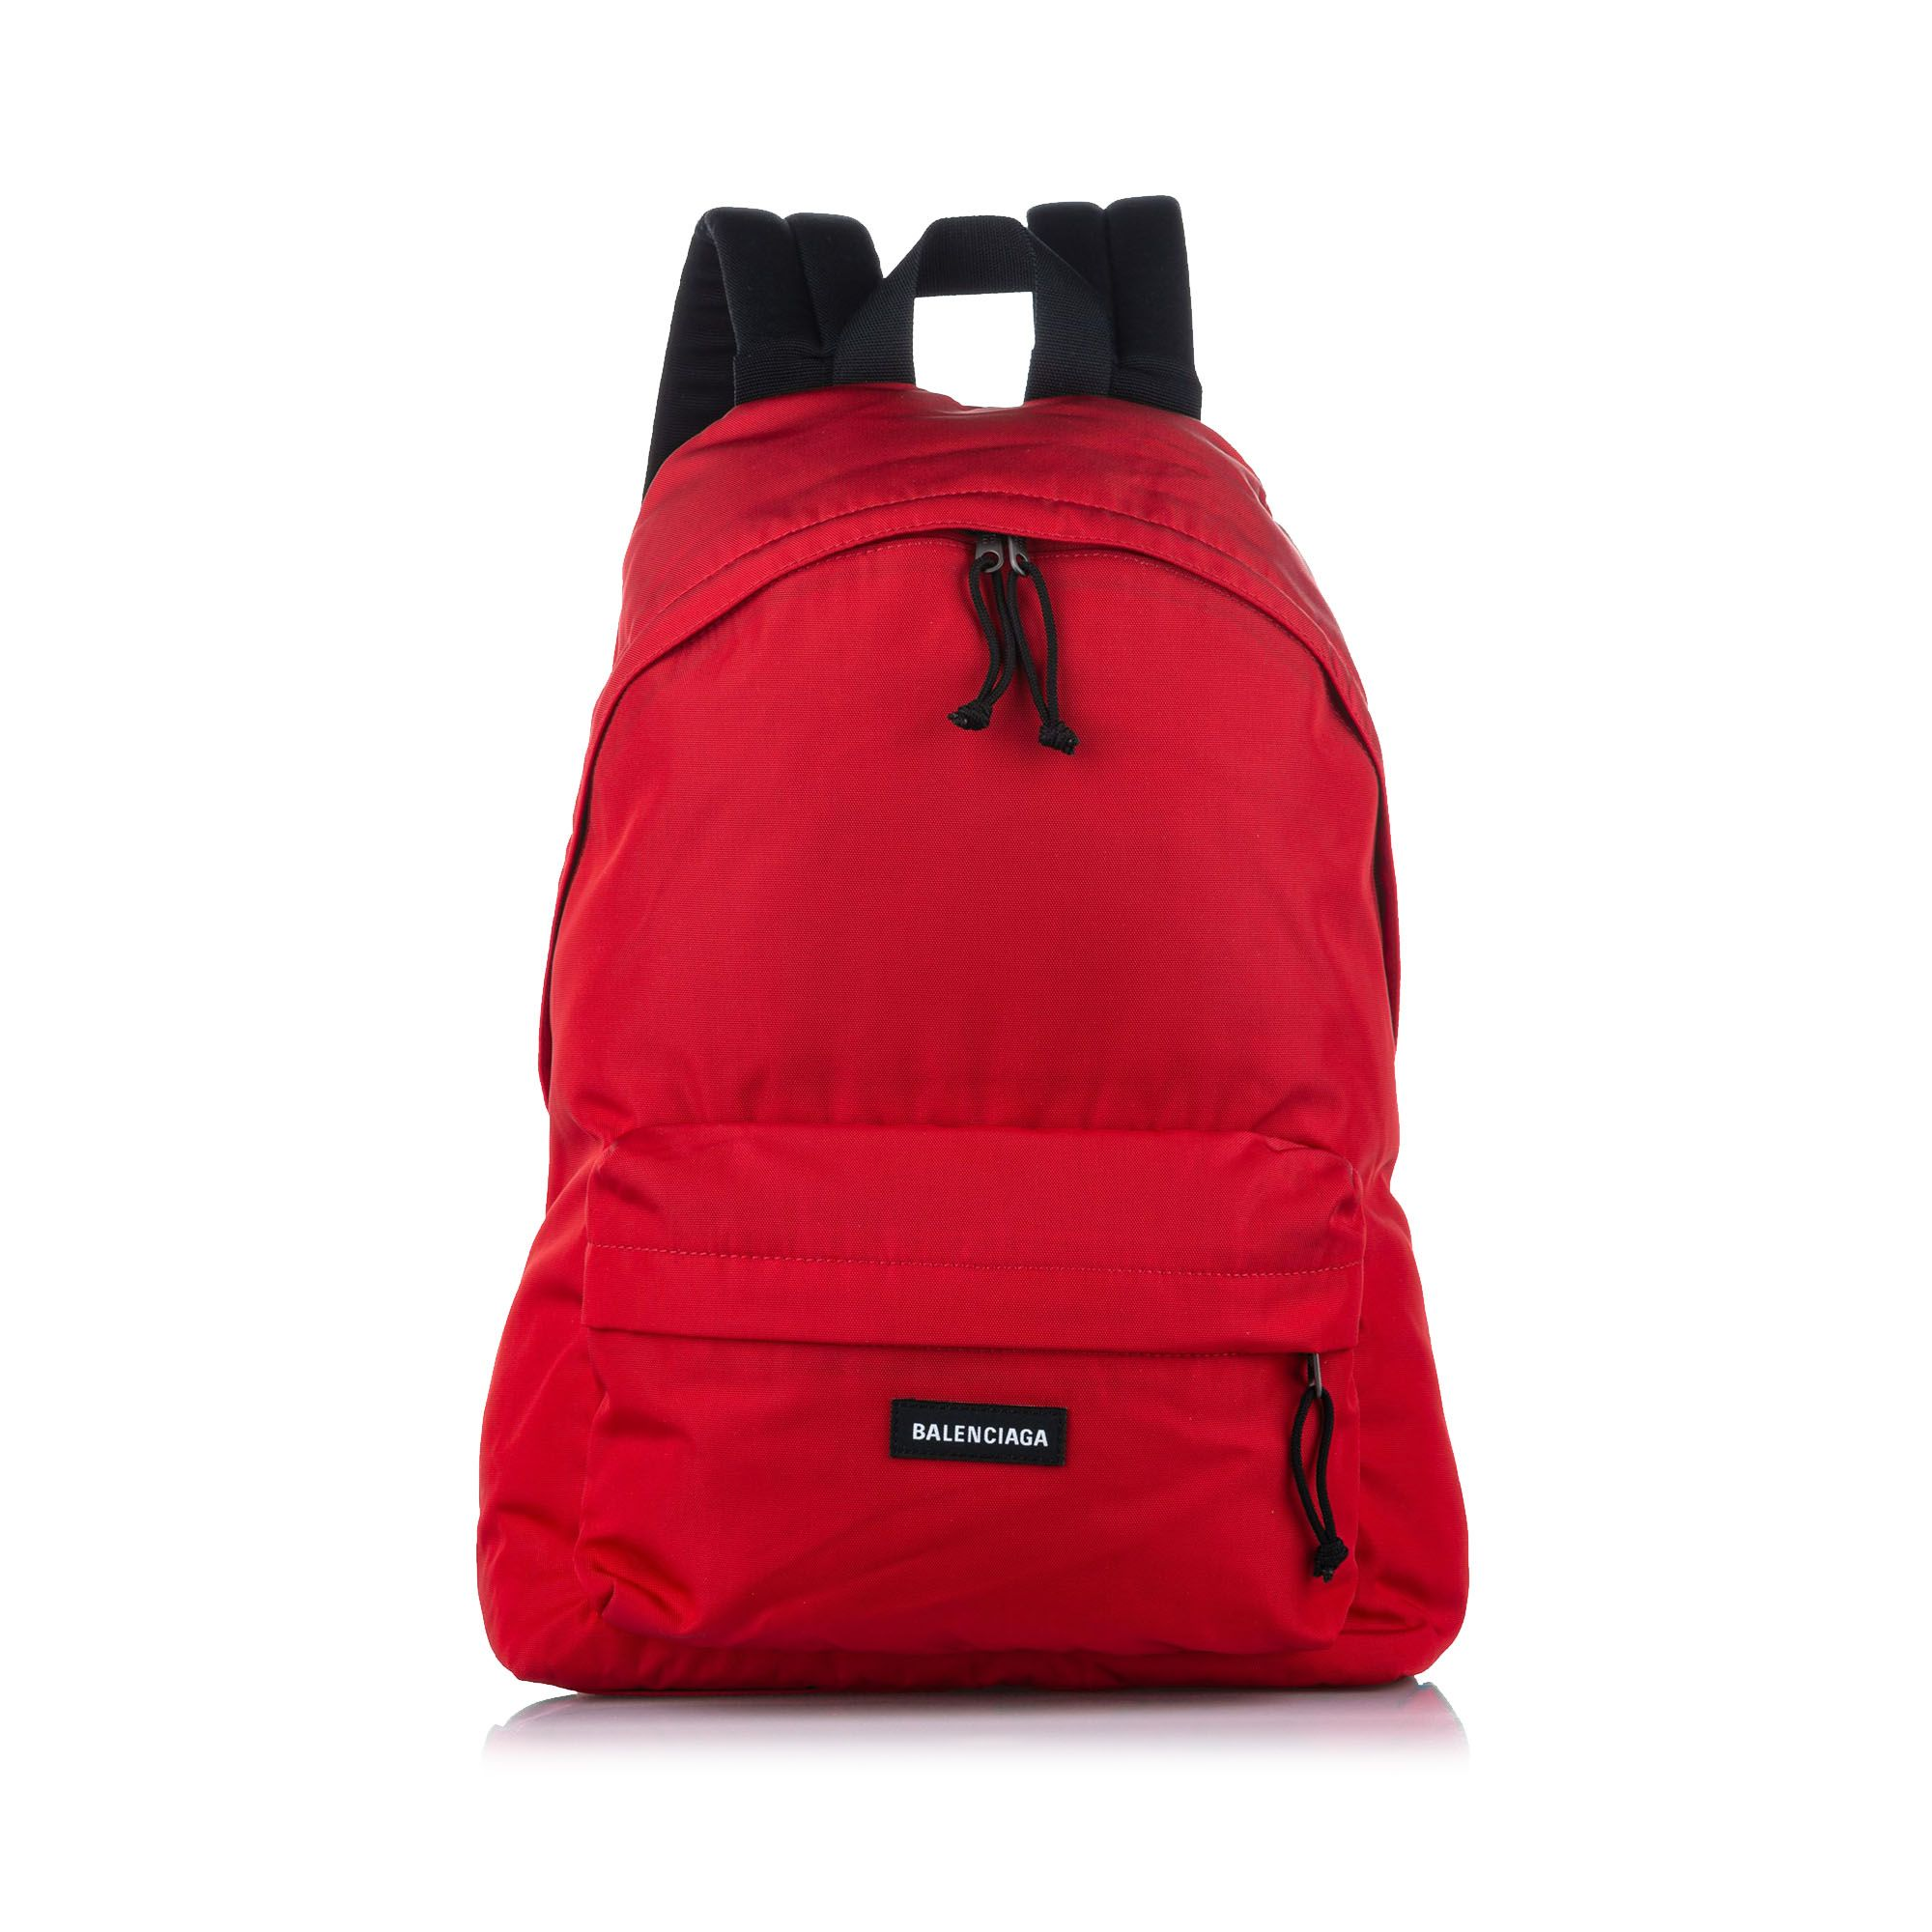 Vintage Balenciaga Explorer Nylon Backpack Red